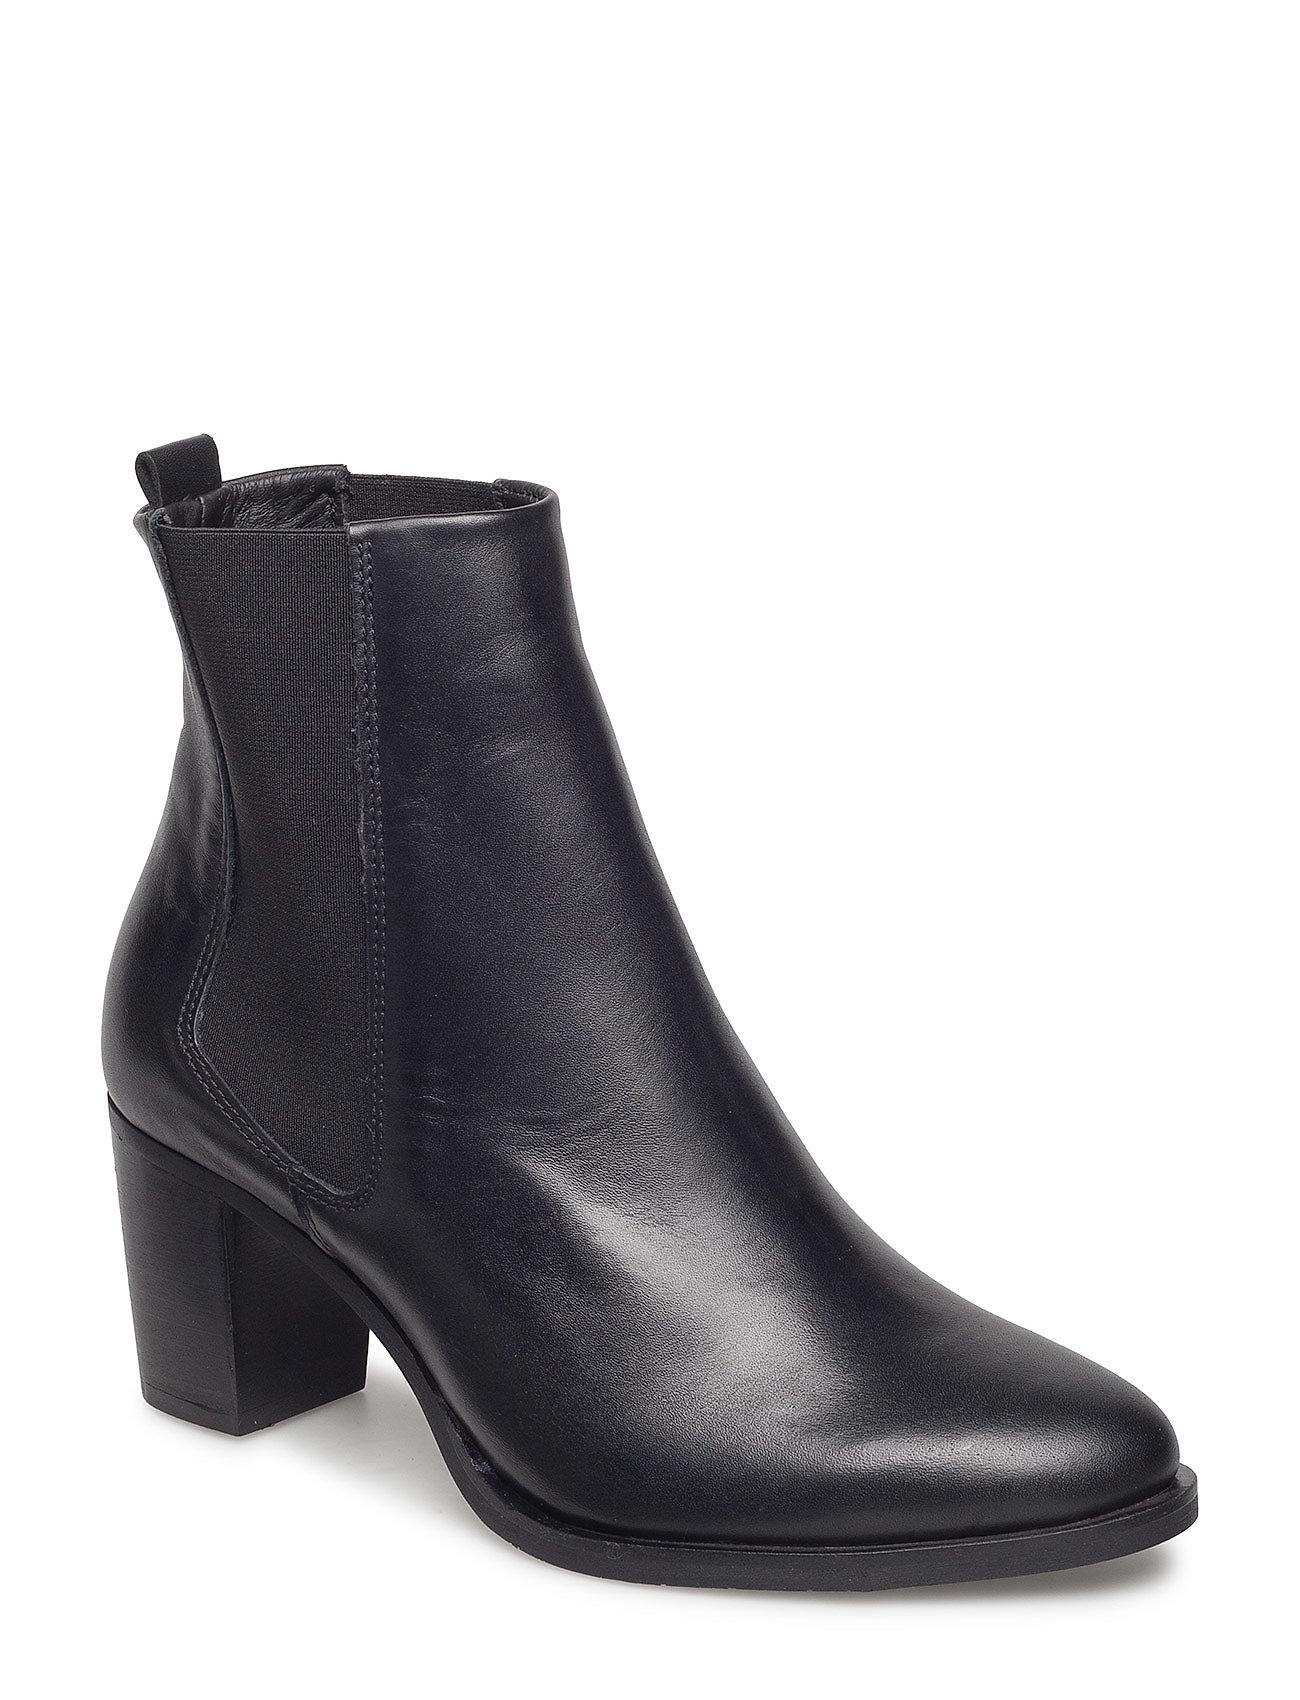 Womens Stellar Blk Chelsea Boots Royal Republiq gqycdfqP